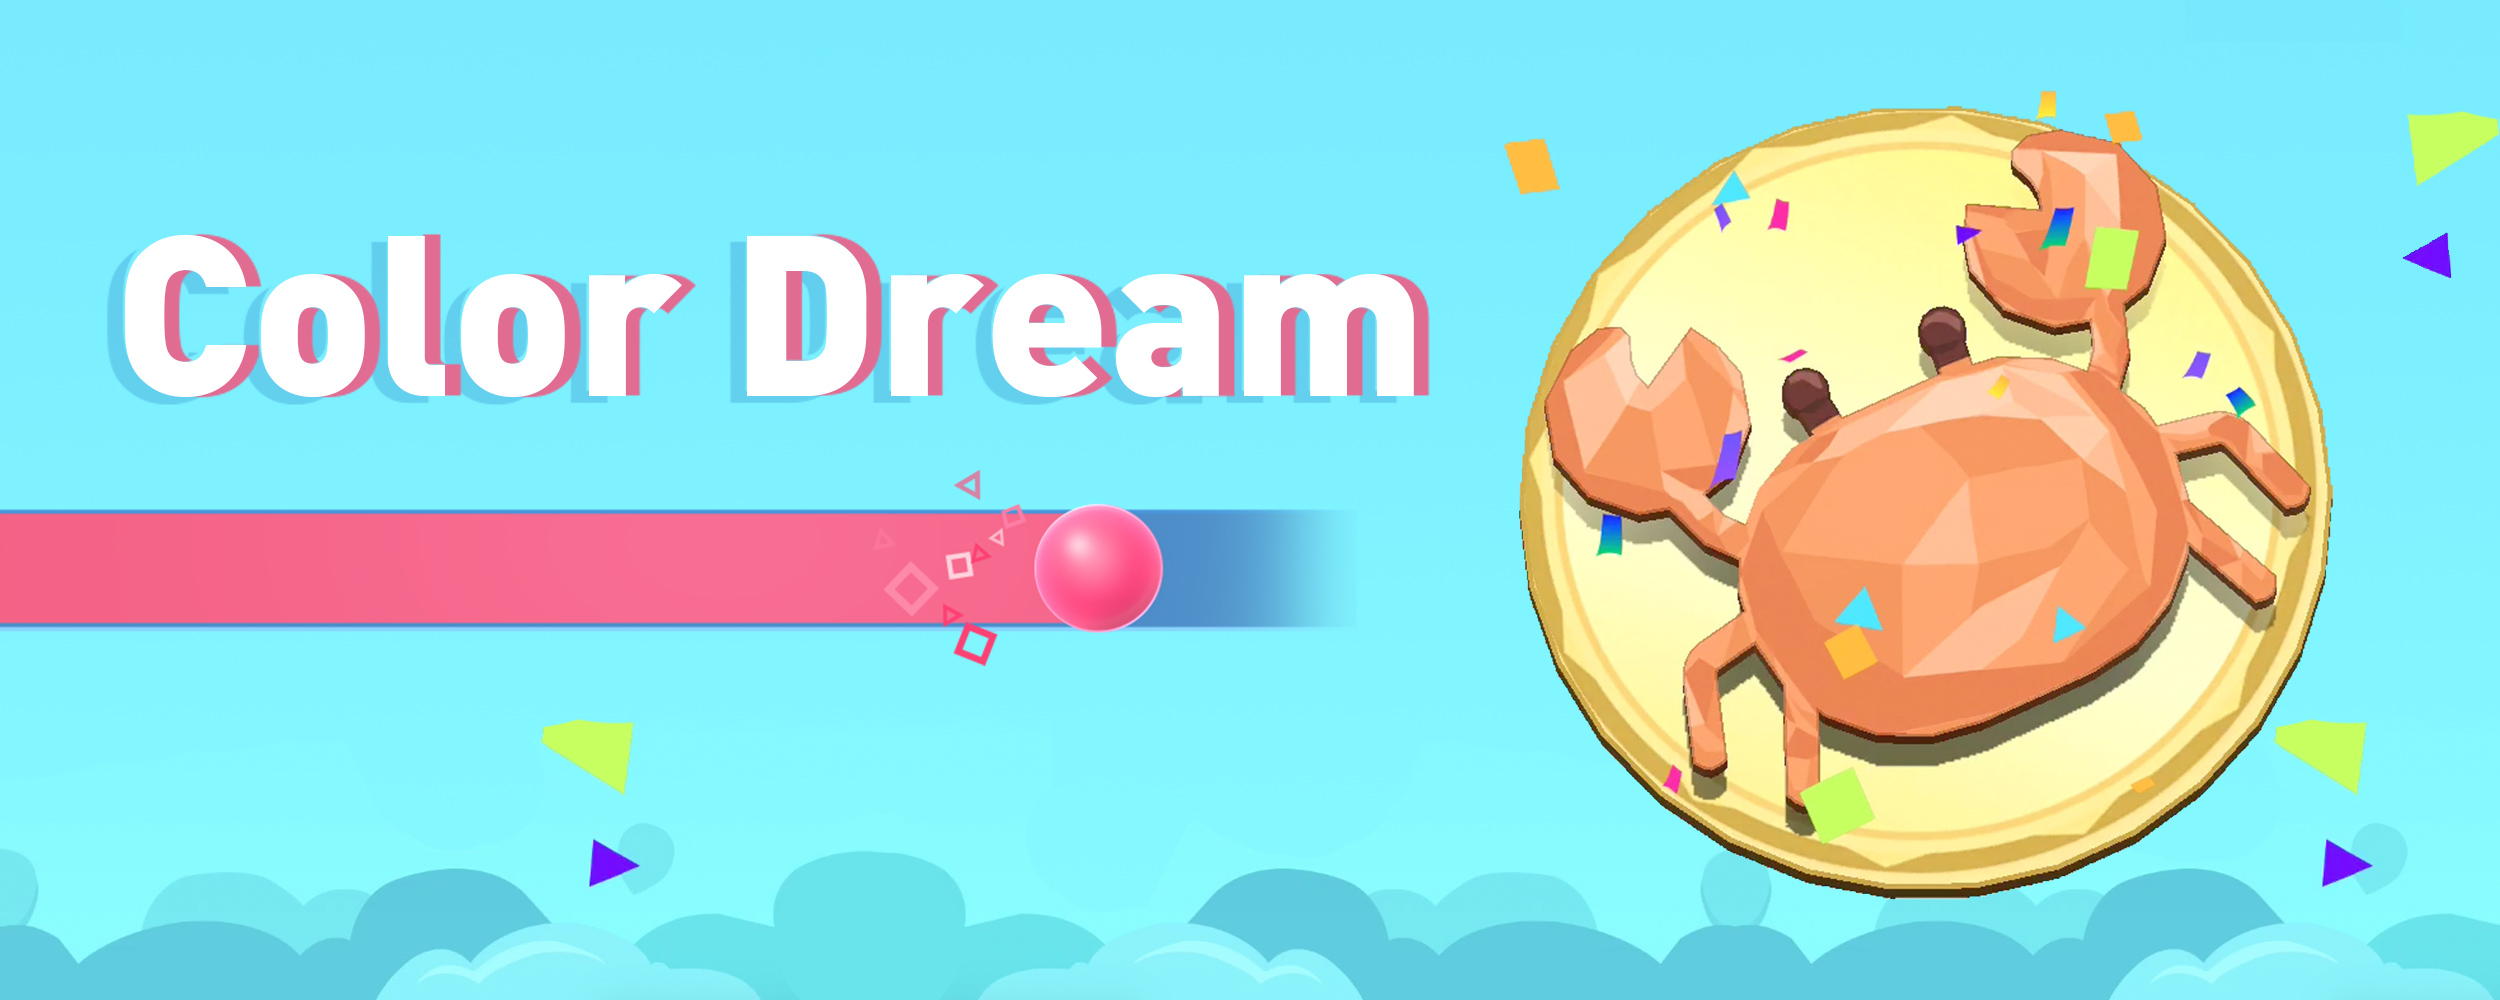 Color Dream.jpg